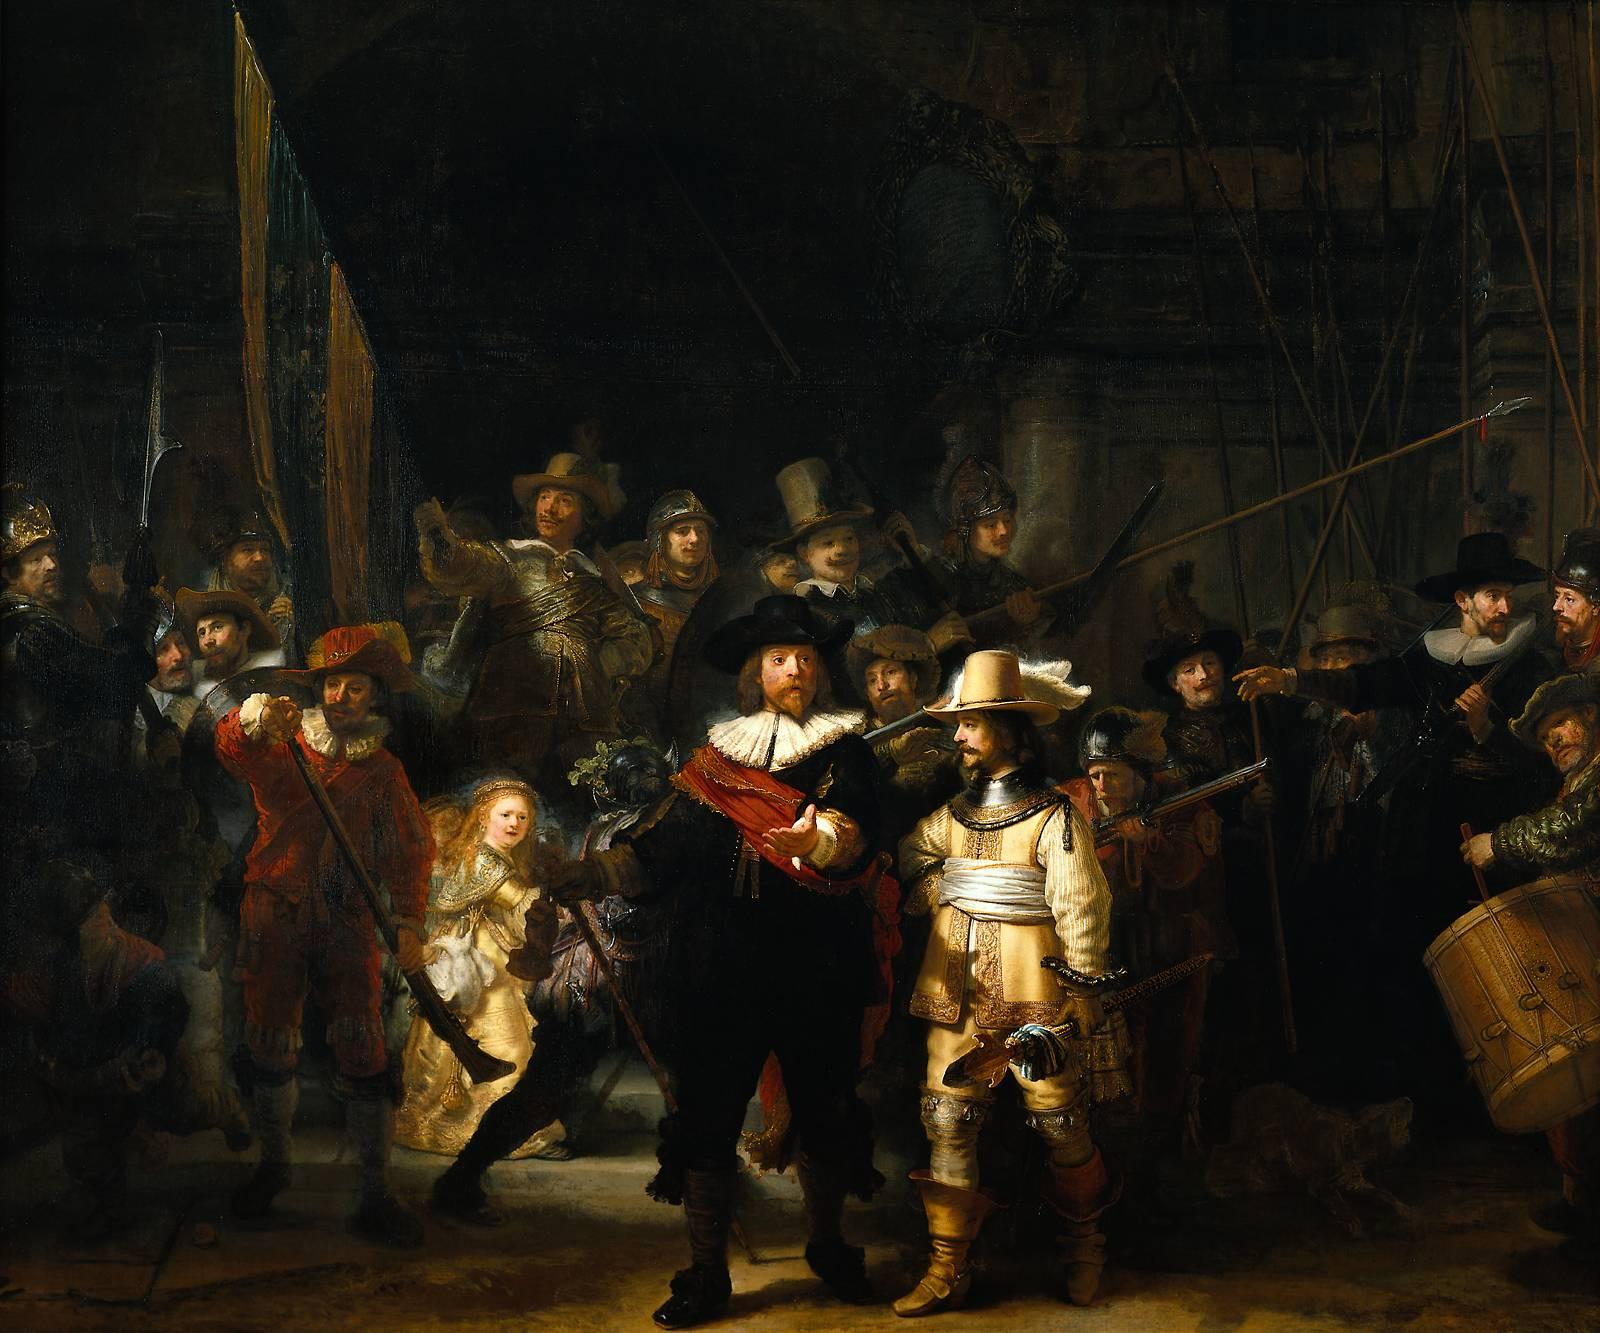 2013-04-05-The_Nightwatch_by_Rembrandt.jpg